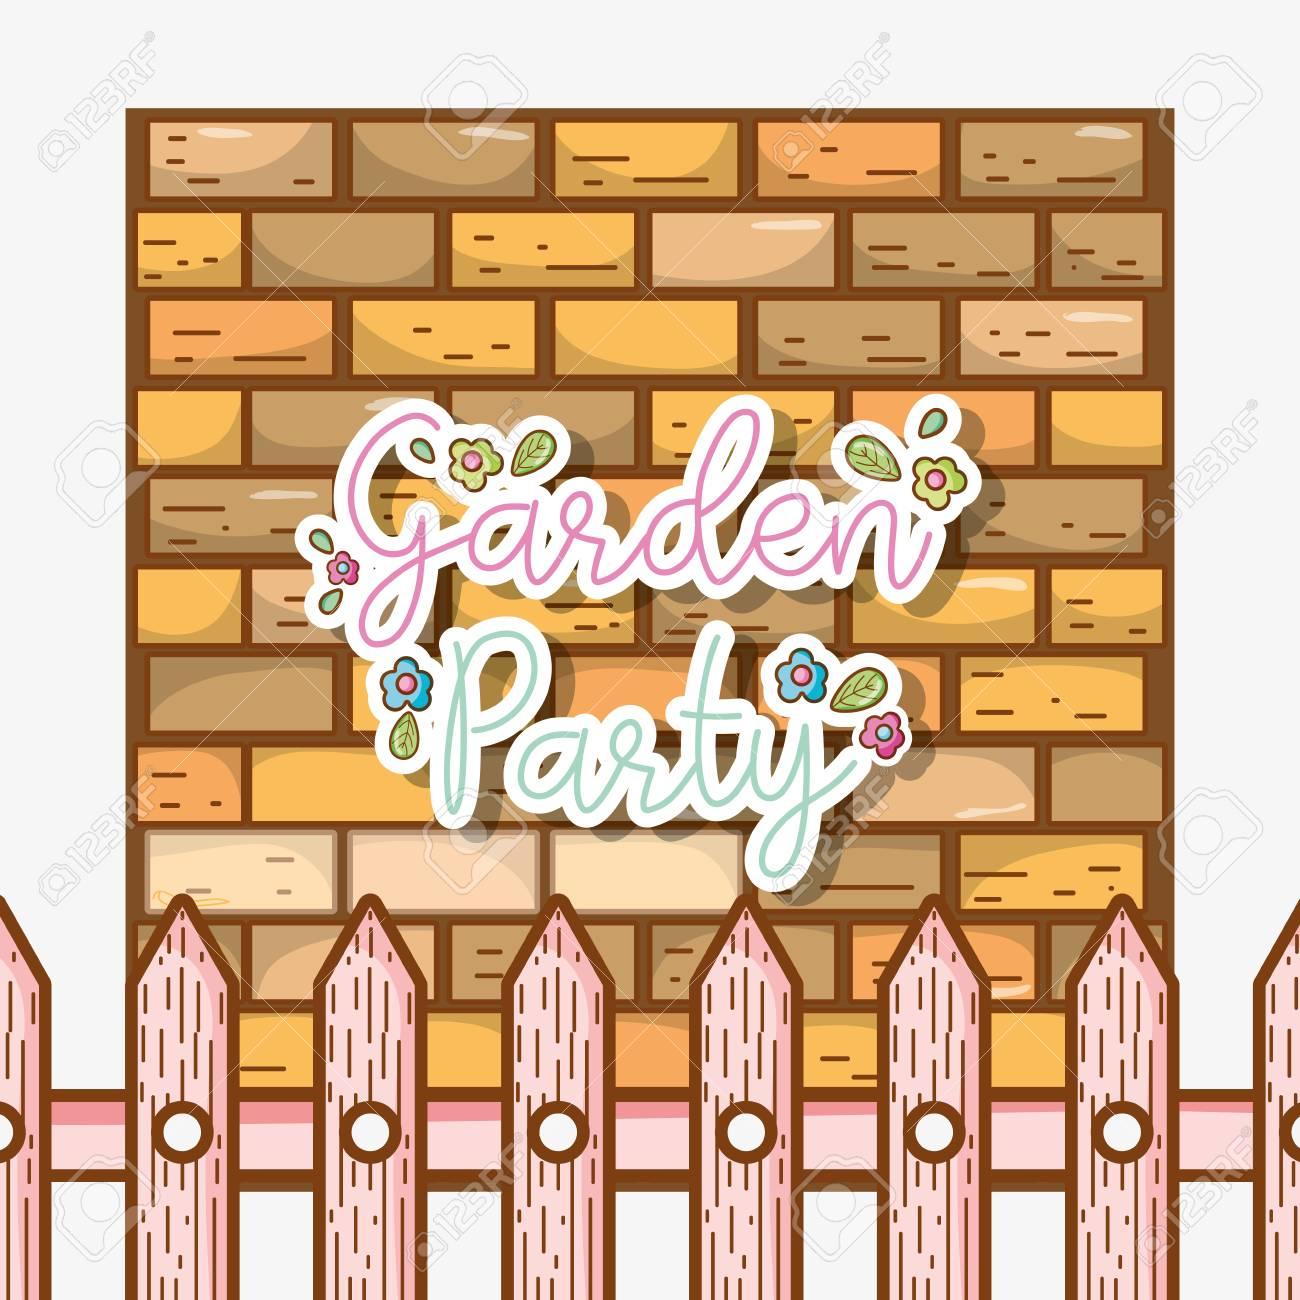 Garden party invitation card with cute cartoons royalty free garden party invitation card with cute cartoons stock vector 98762748 stopboris Choice Image